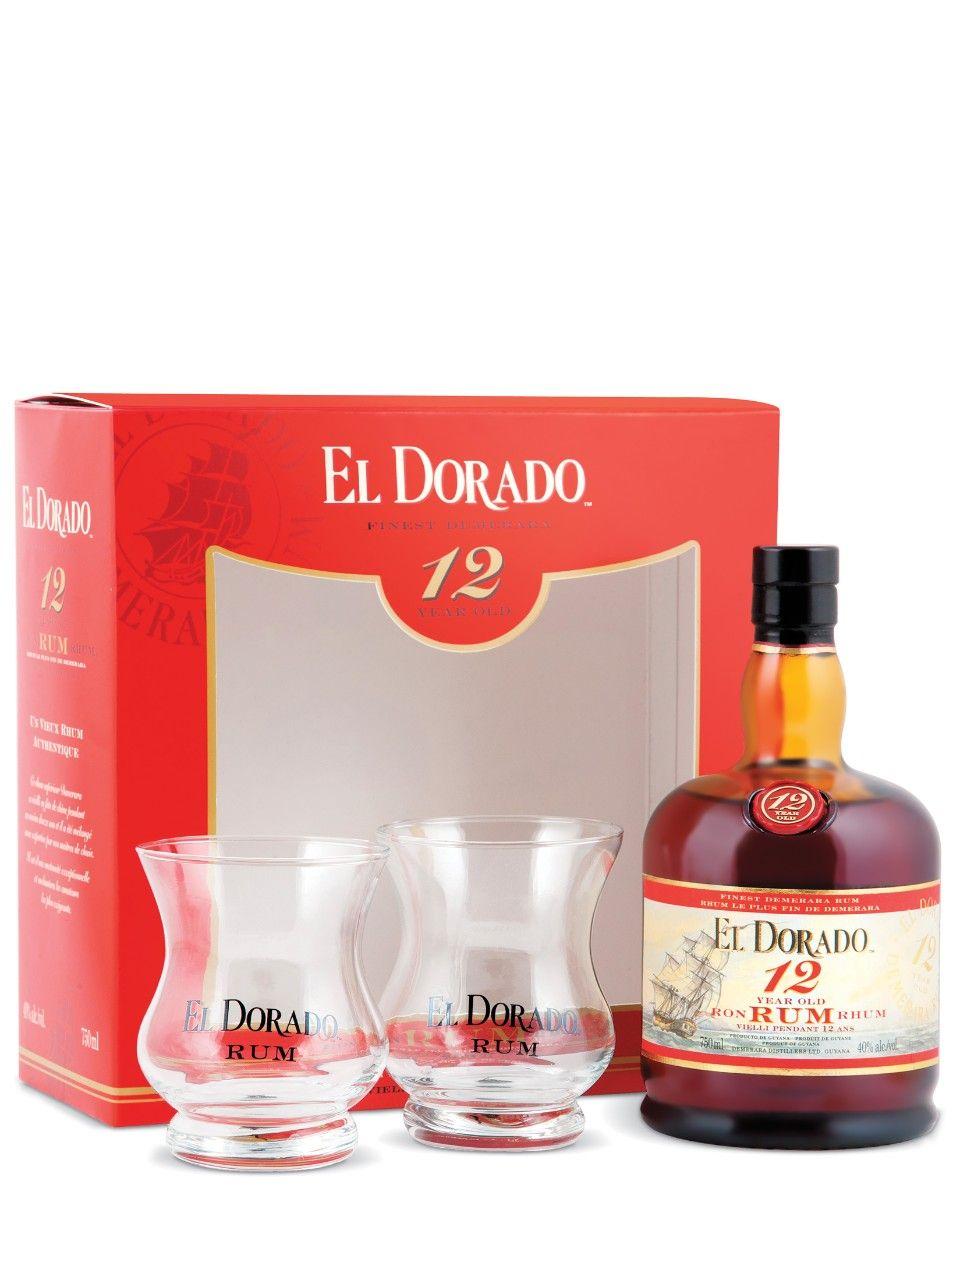 El Dorado 12 Year Old Gift Pack With 2 Glasses Wine Bottle Gift Packs Favorite Wine